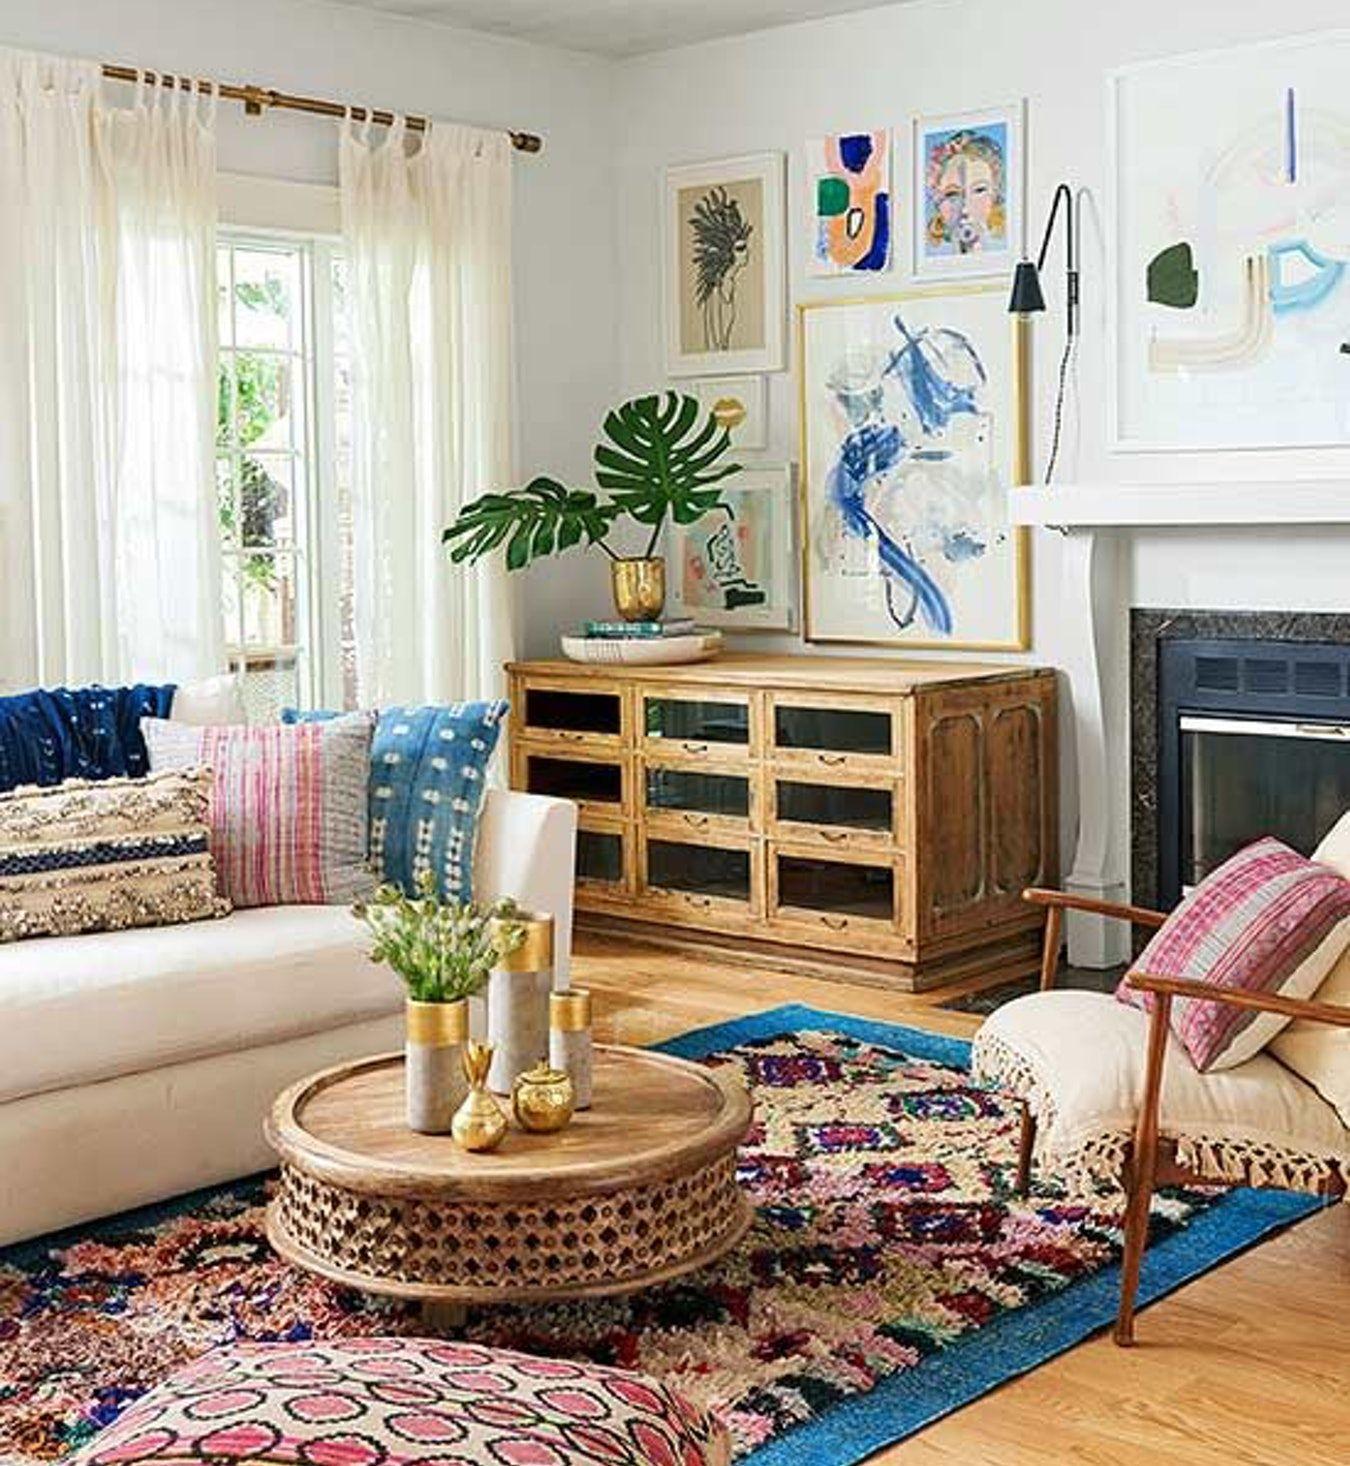 interior design style quiz  bohemian style living room